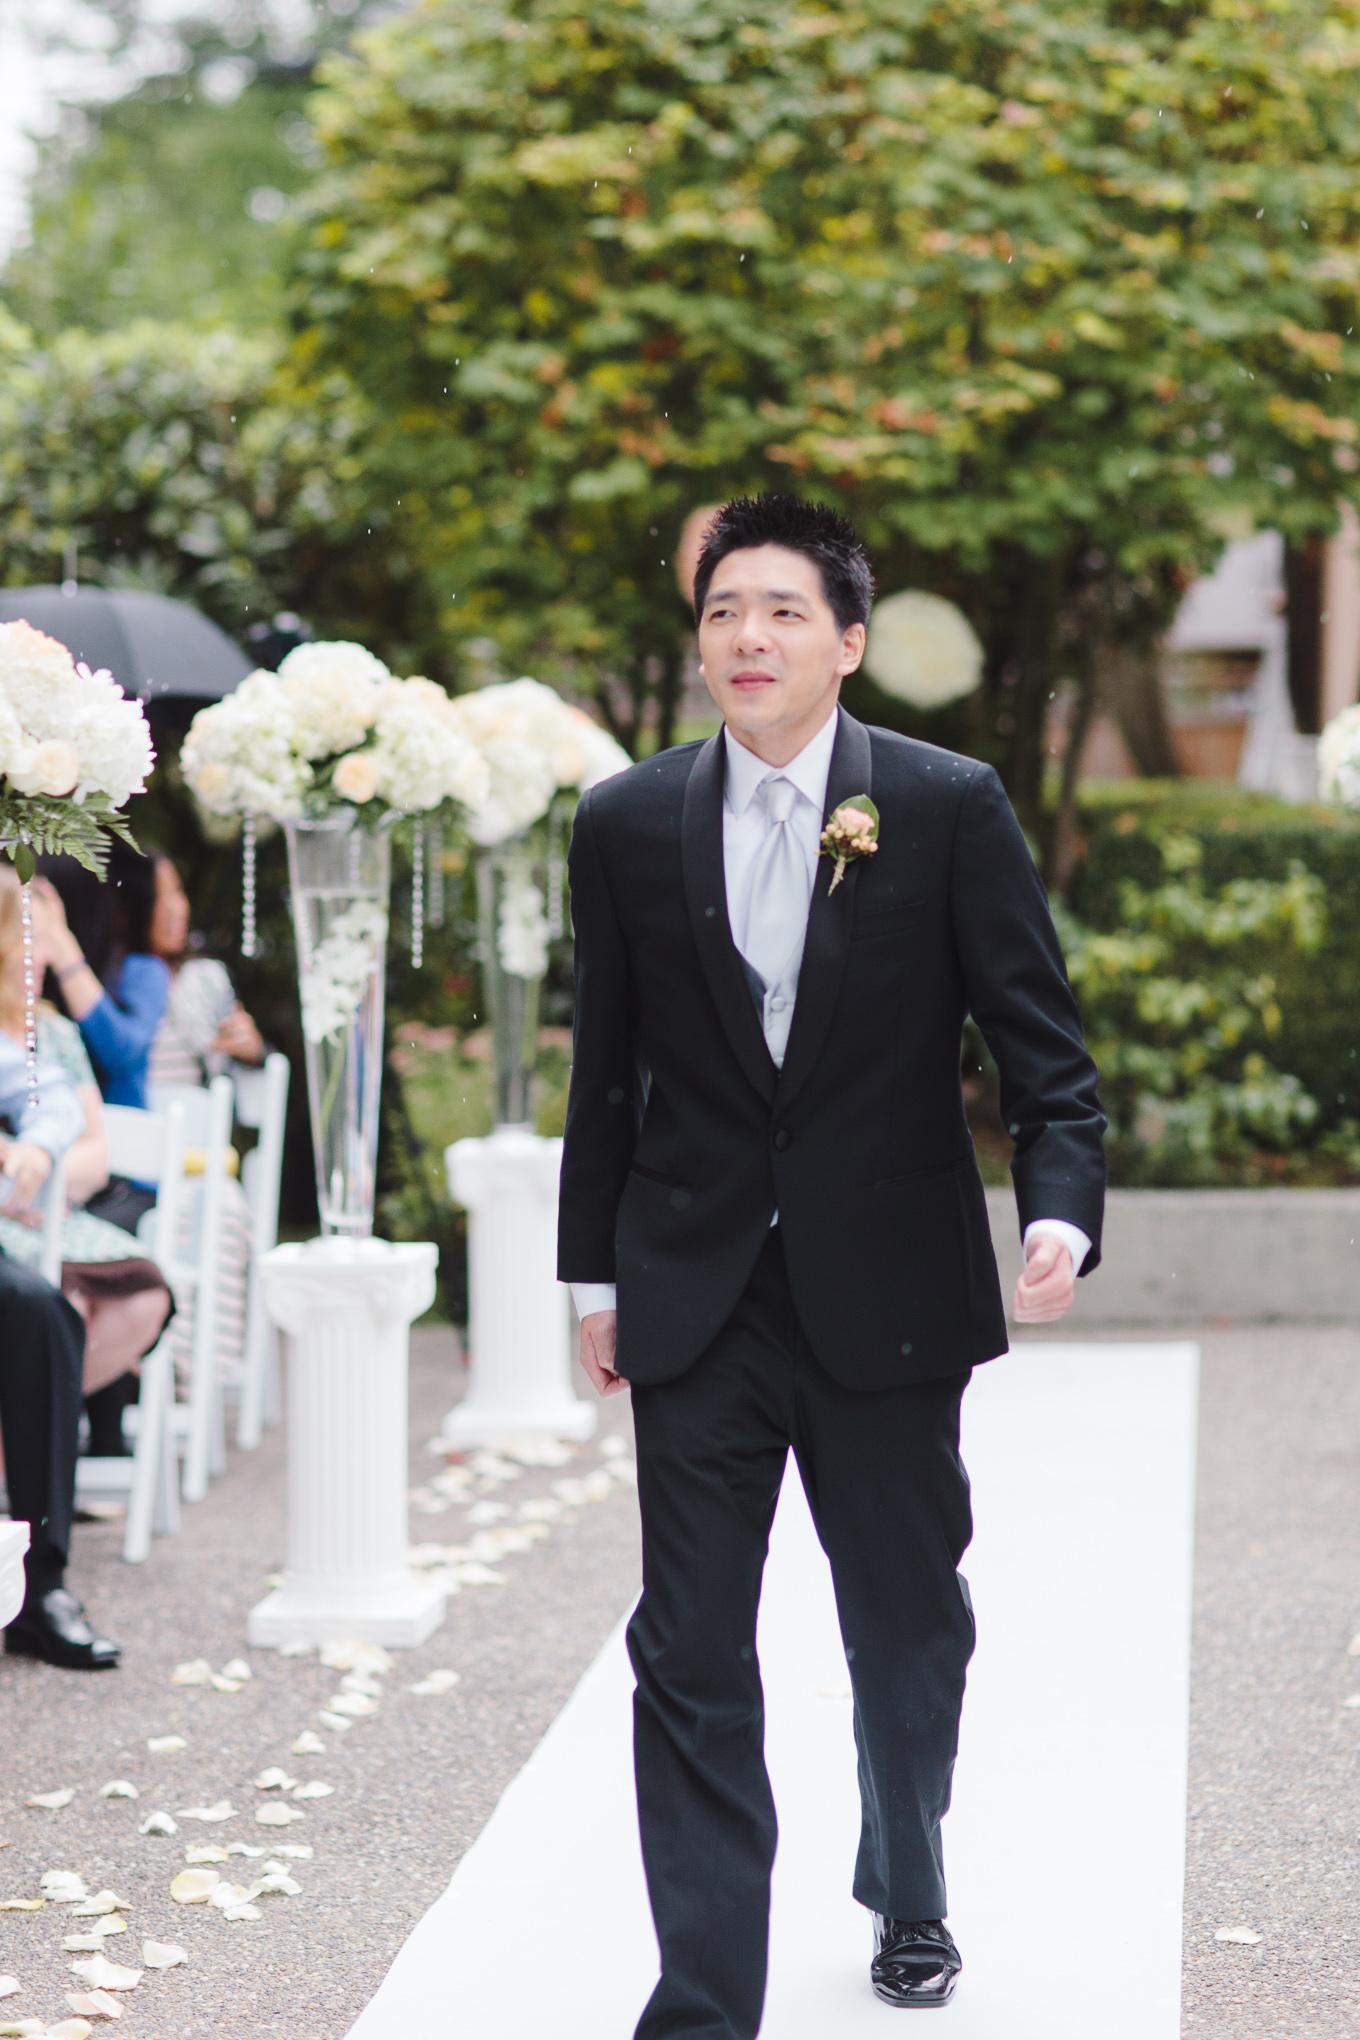 MR-JennyMike-20-009.jpg